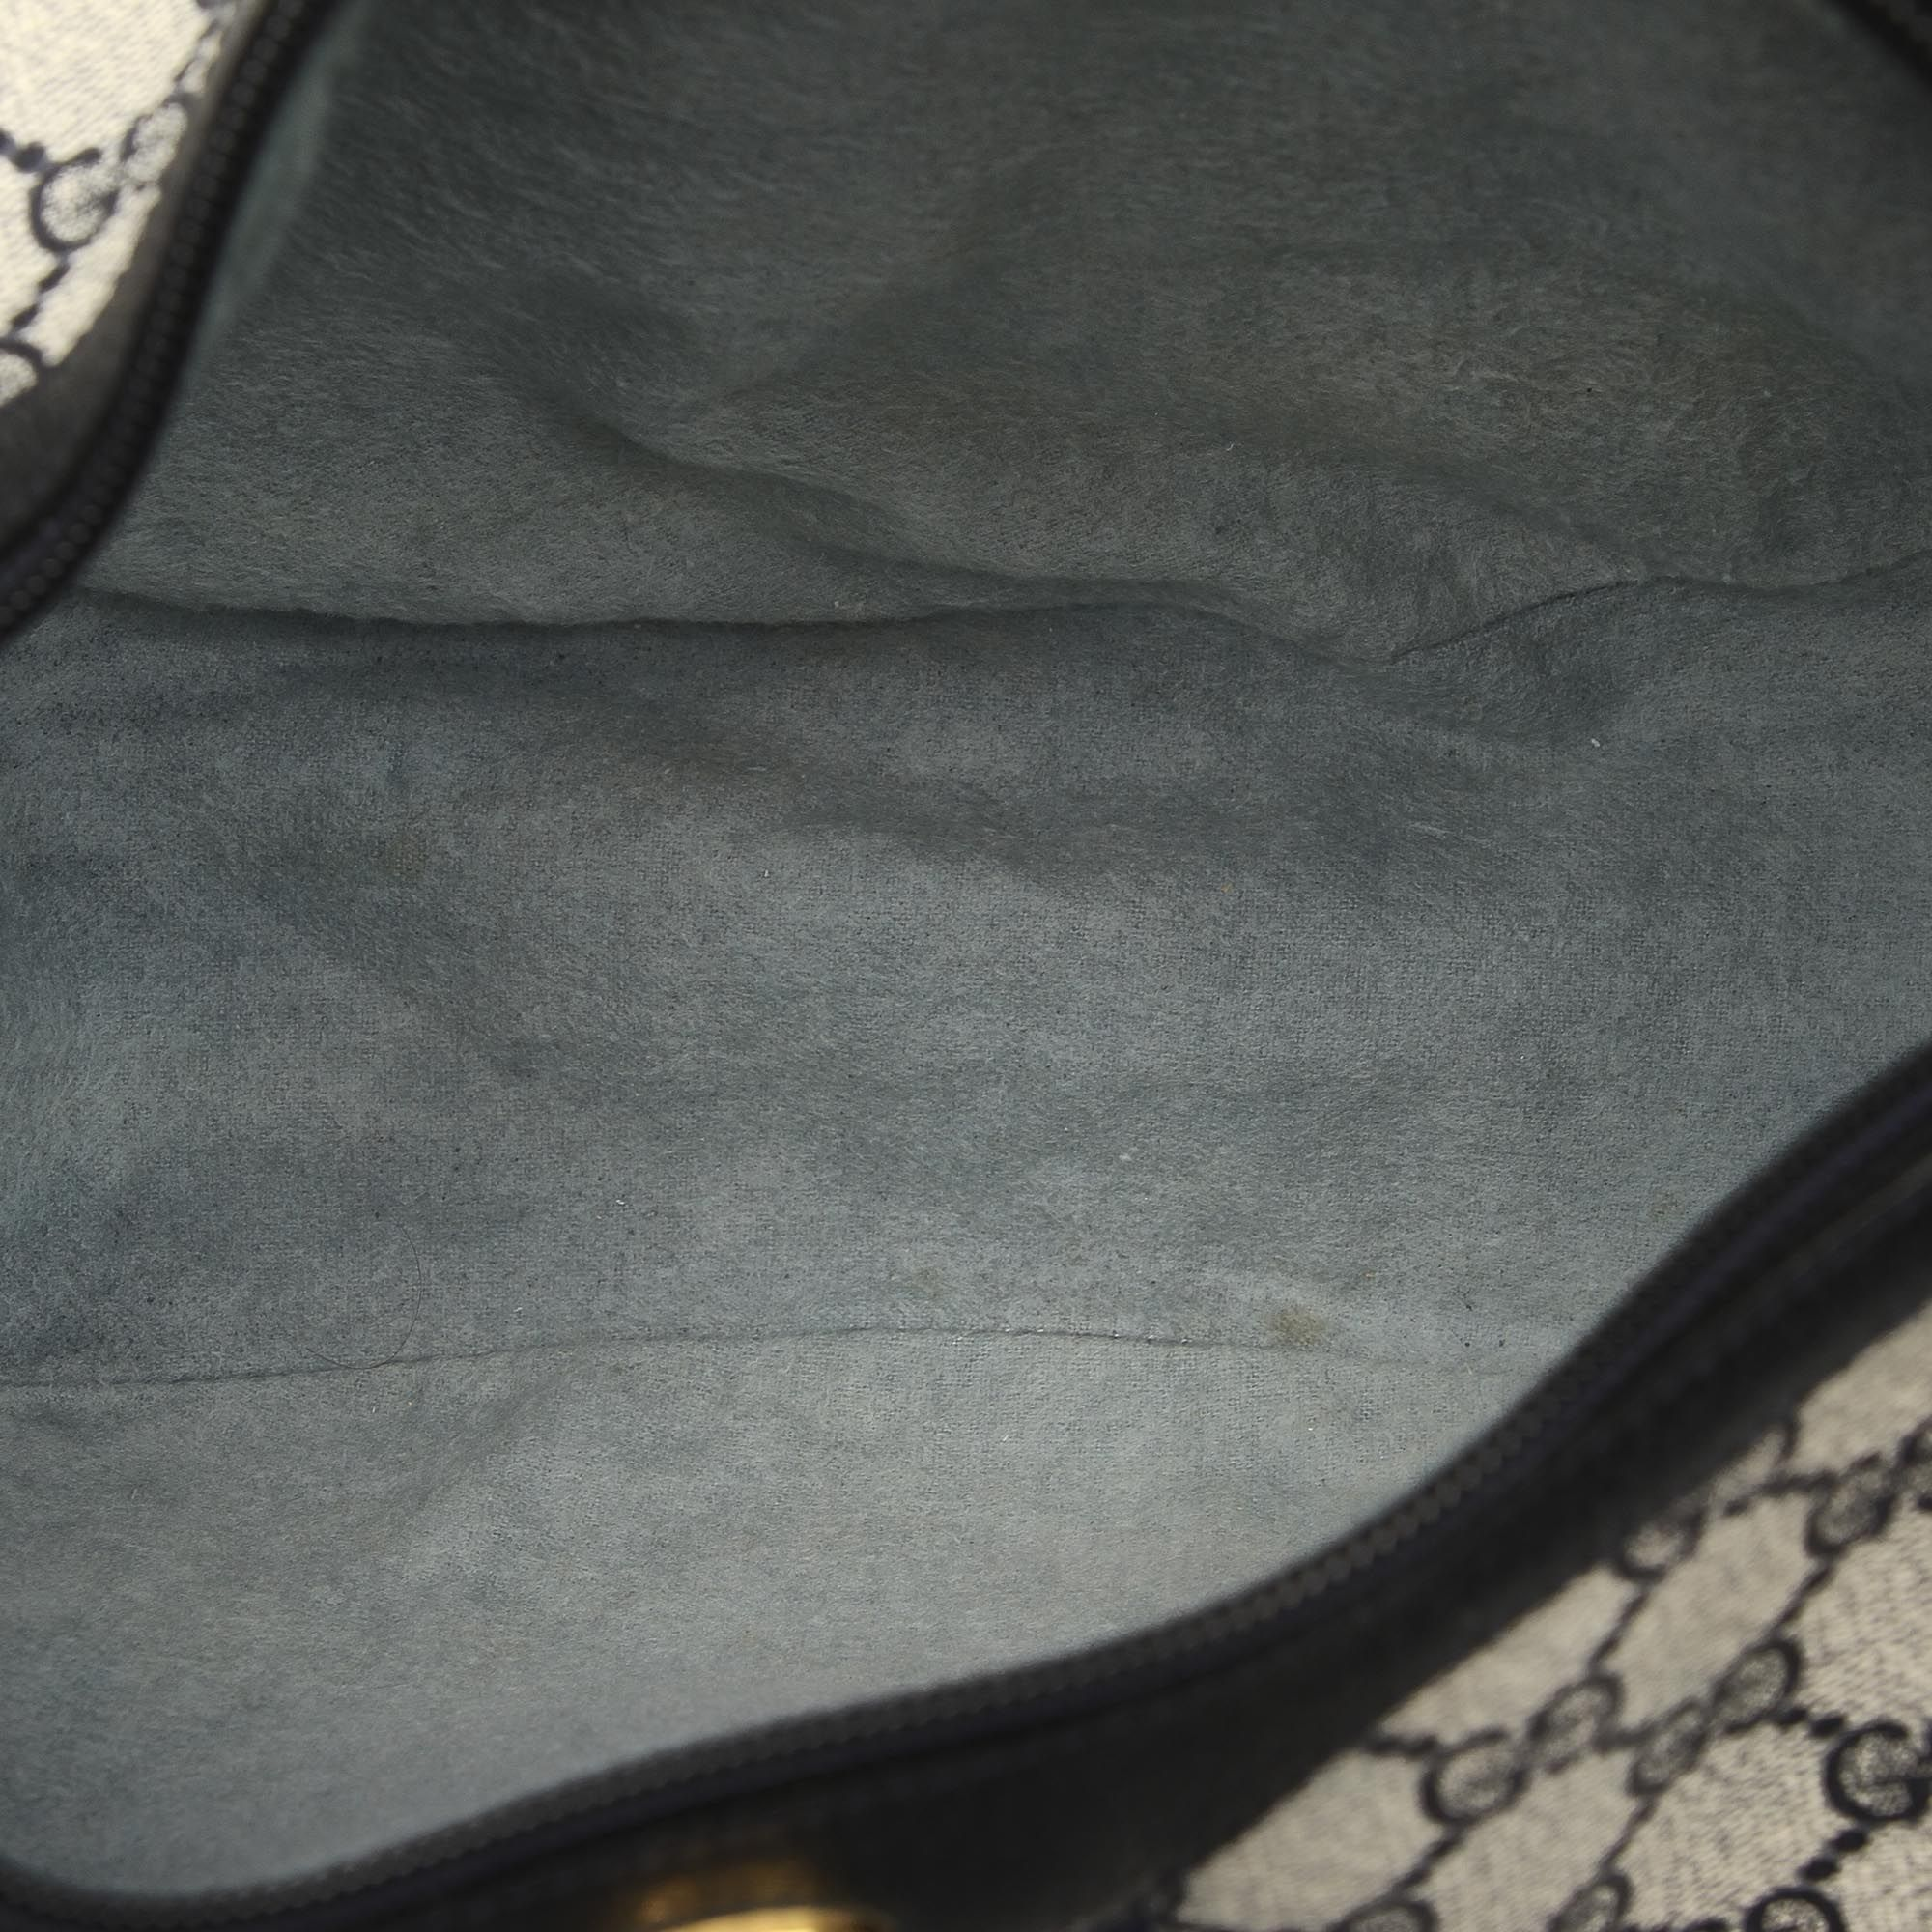 Vintage Gucci GG Canvas Web Crossbody Bag Gray